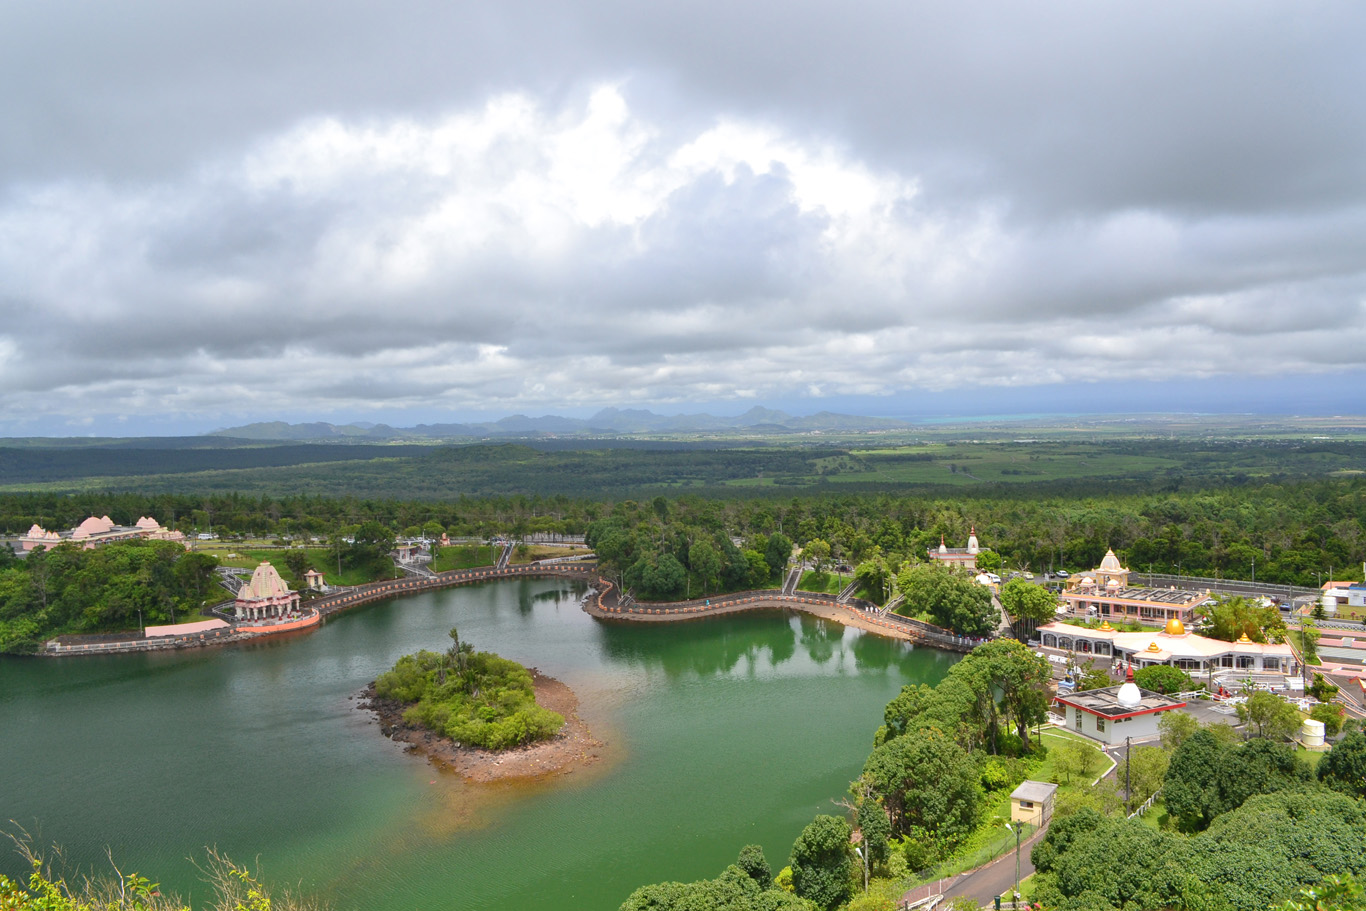 The view over Ganga talao